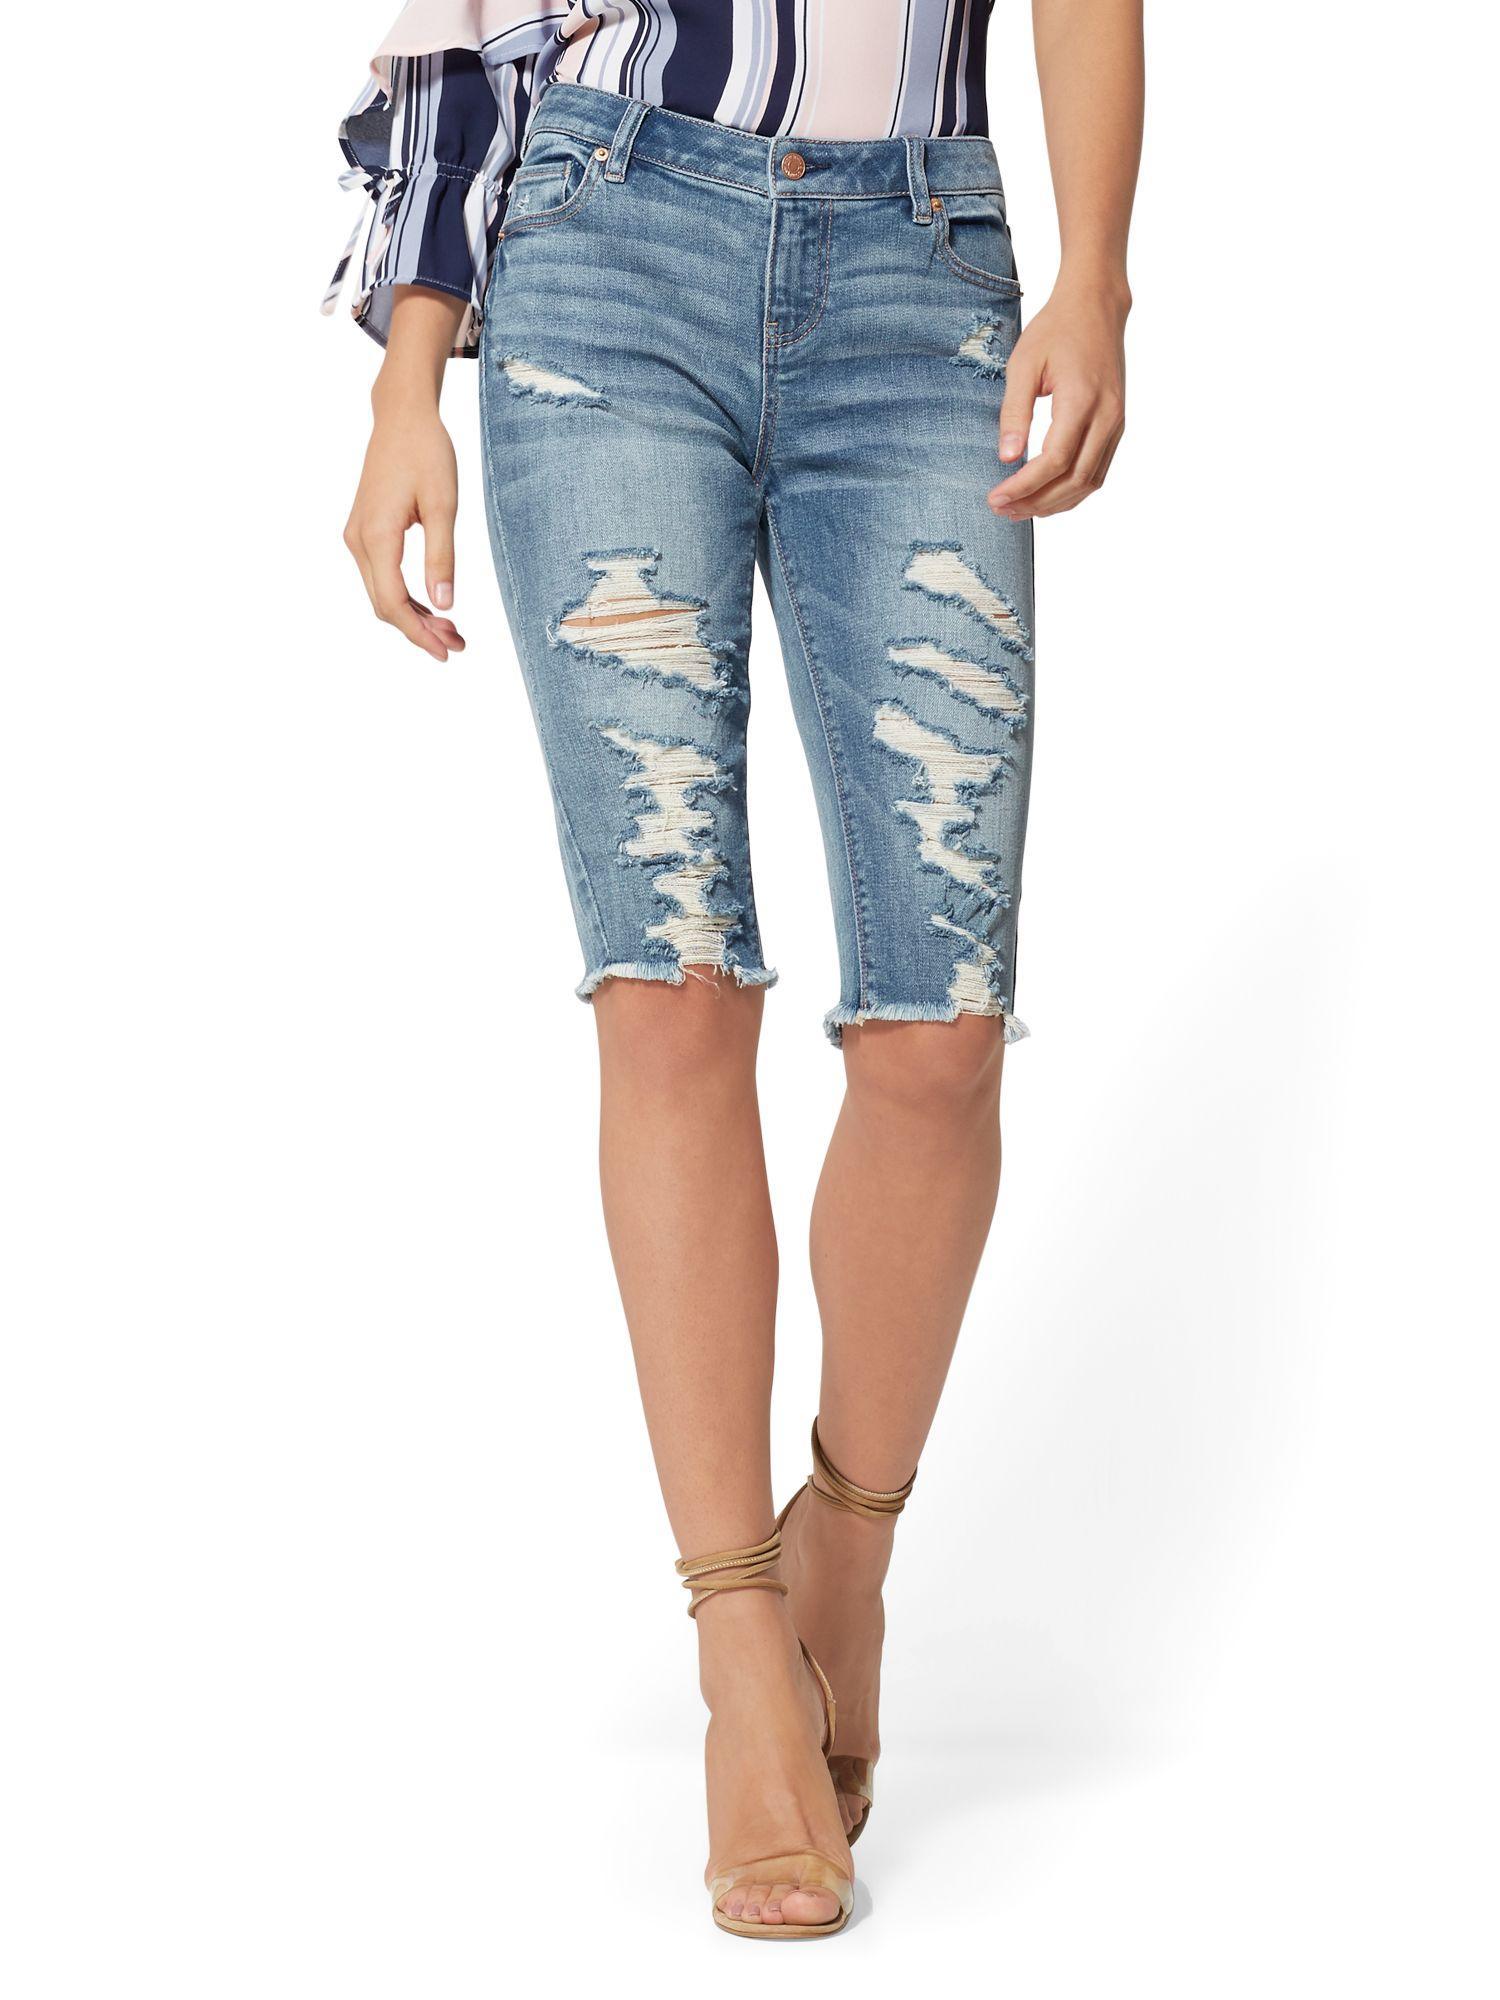 65fdbb5778 New York   Company. Women s Destroyed 14 Inch Bowery Bermuda Short - Boogie  Blue - Soho Jeans